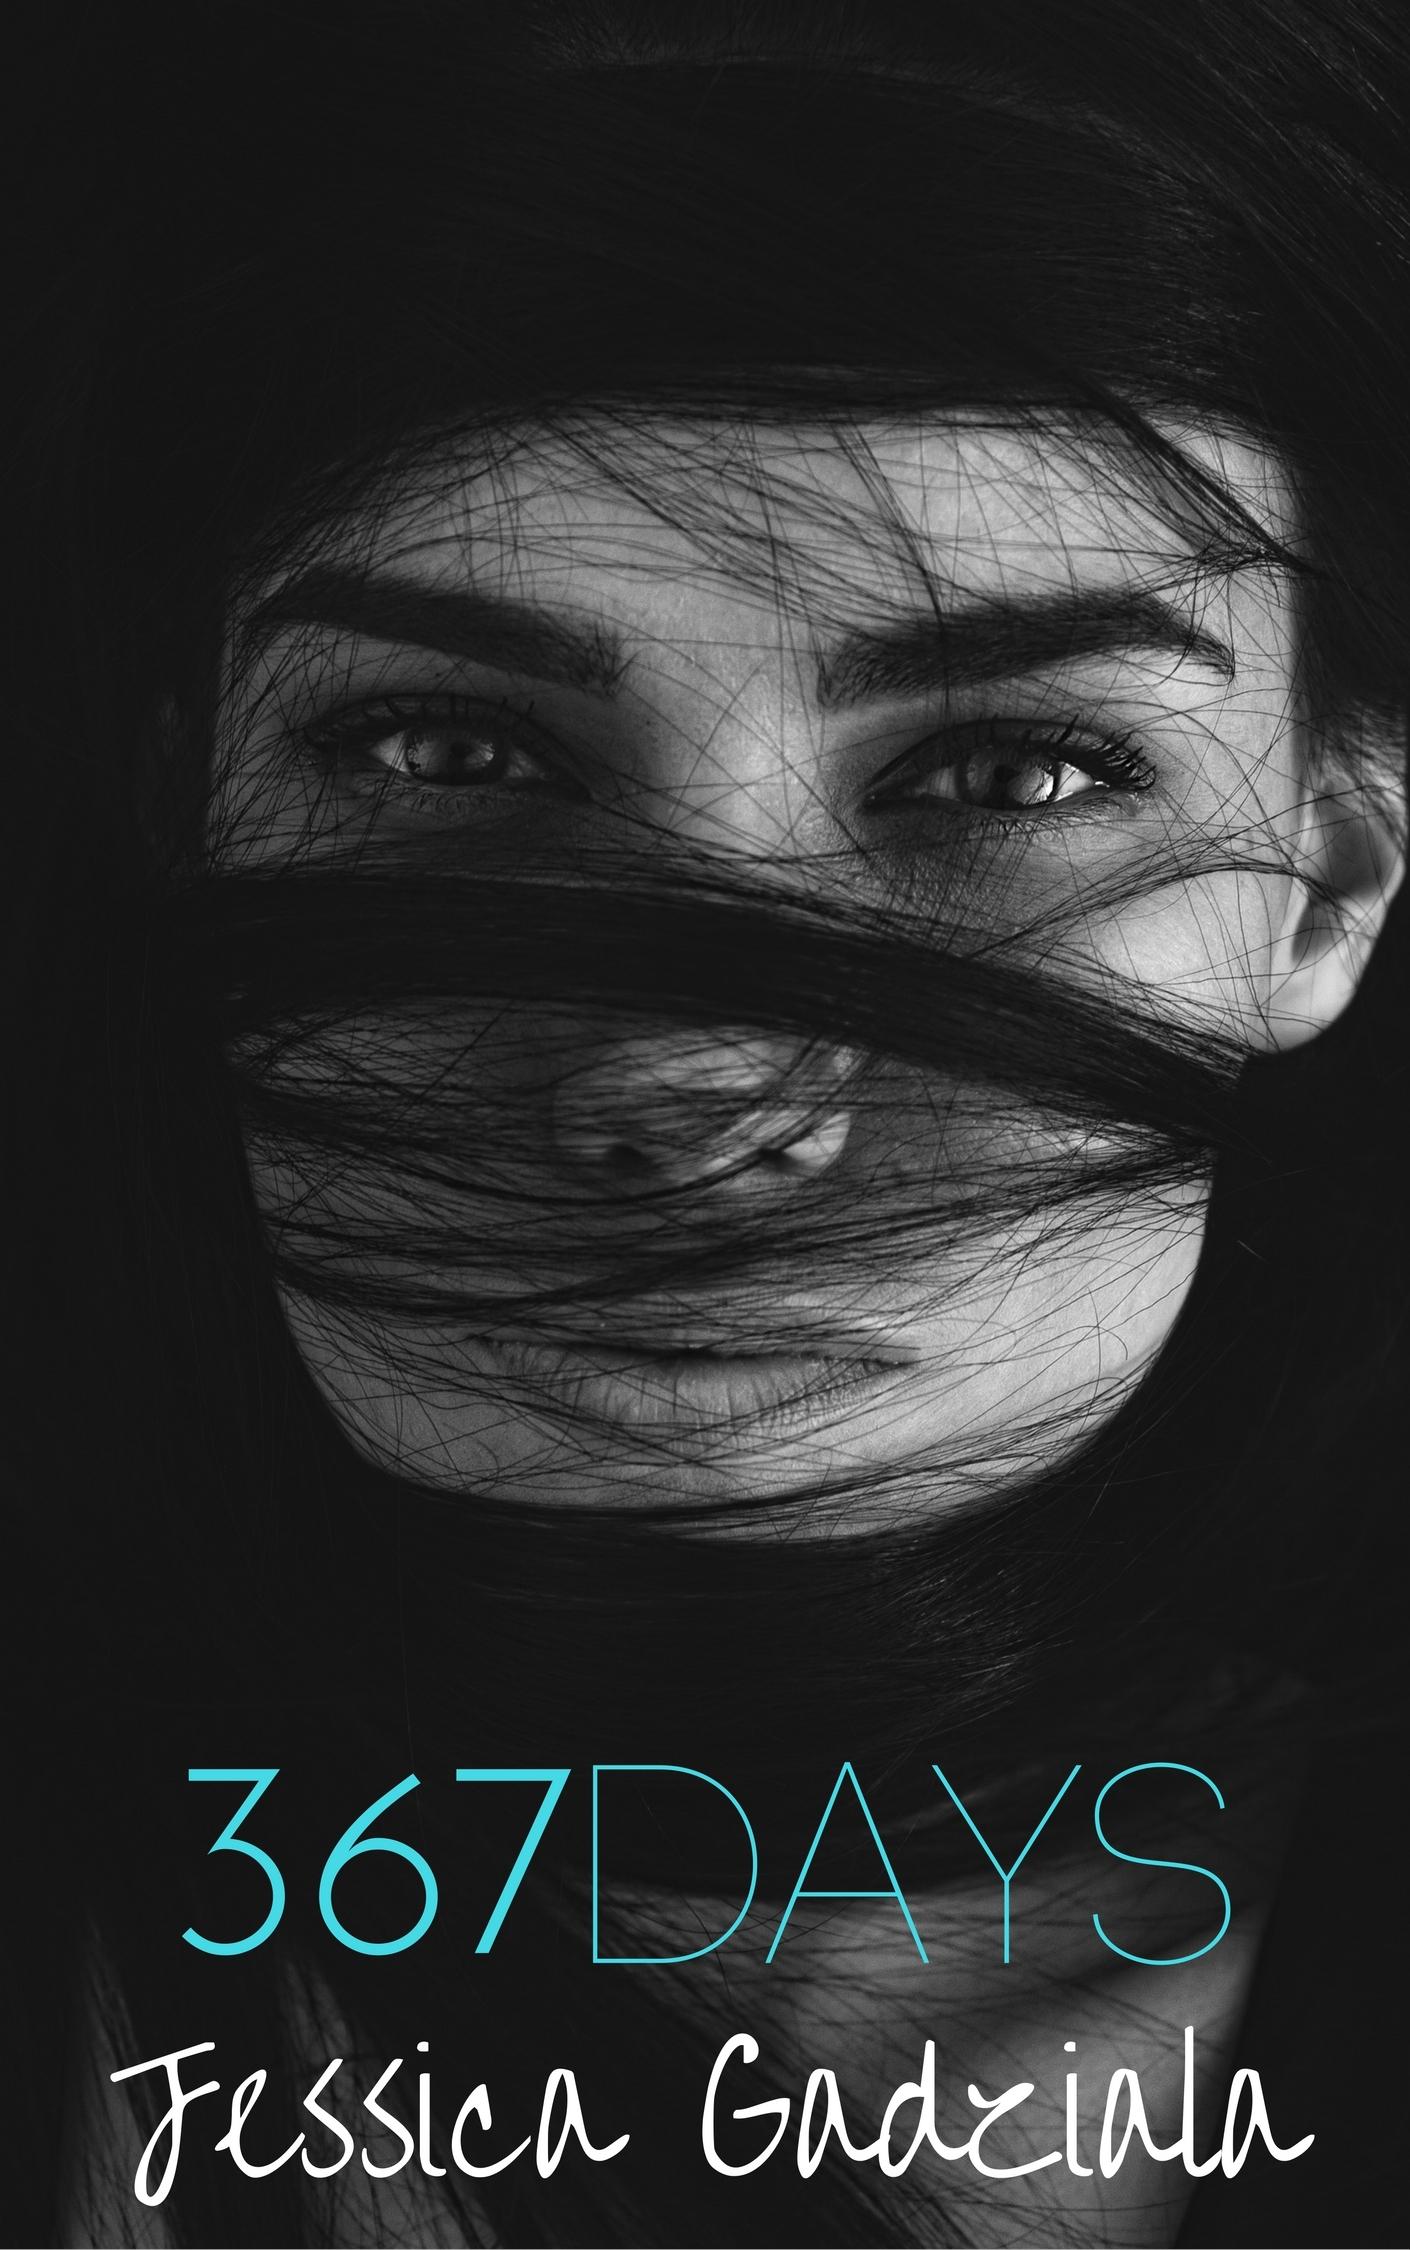 Jessica Gadziala - Investigators 1 - 367 Days